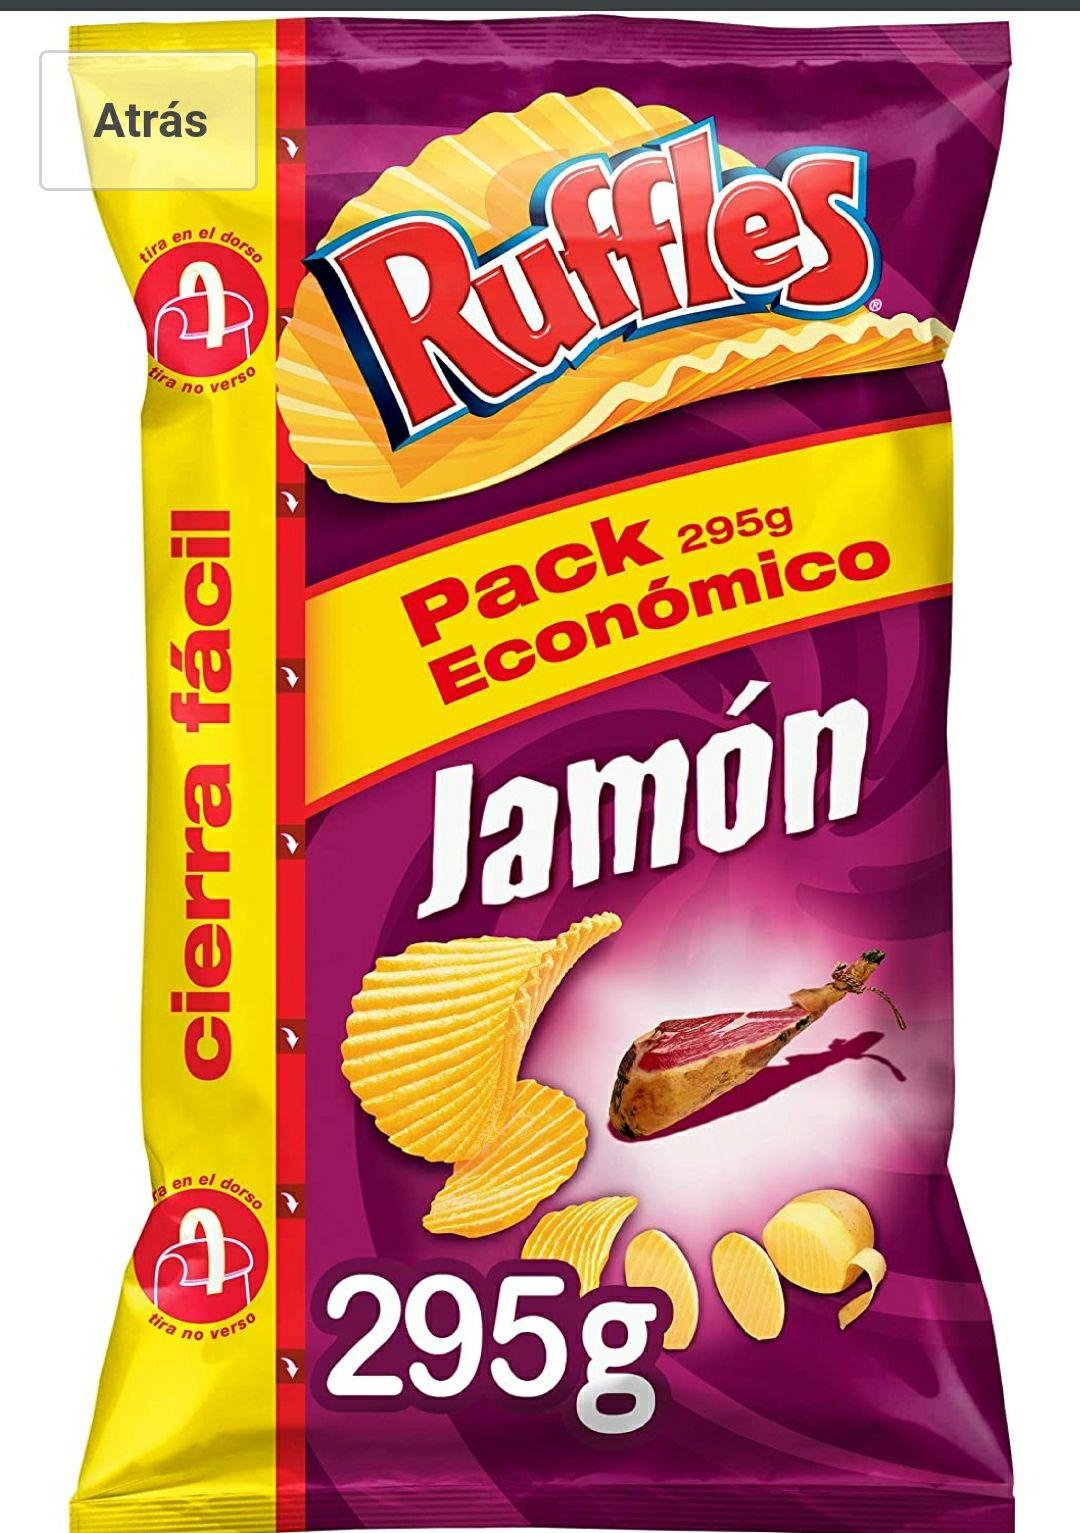 Ruffles Jamon, Patatas fritas - 295